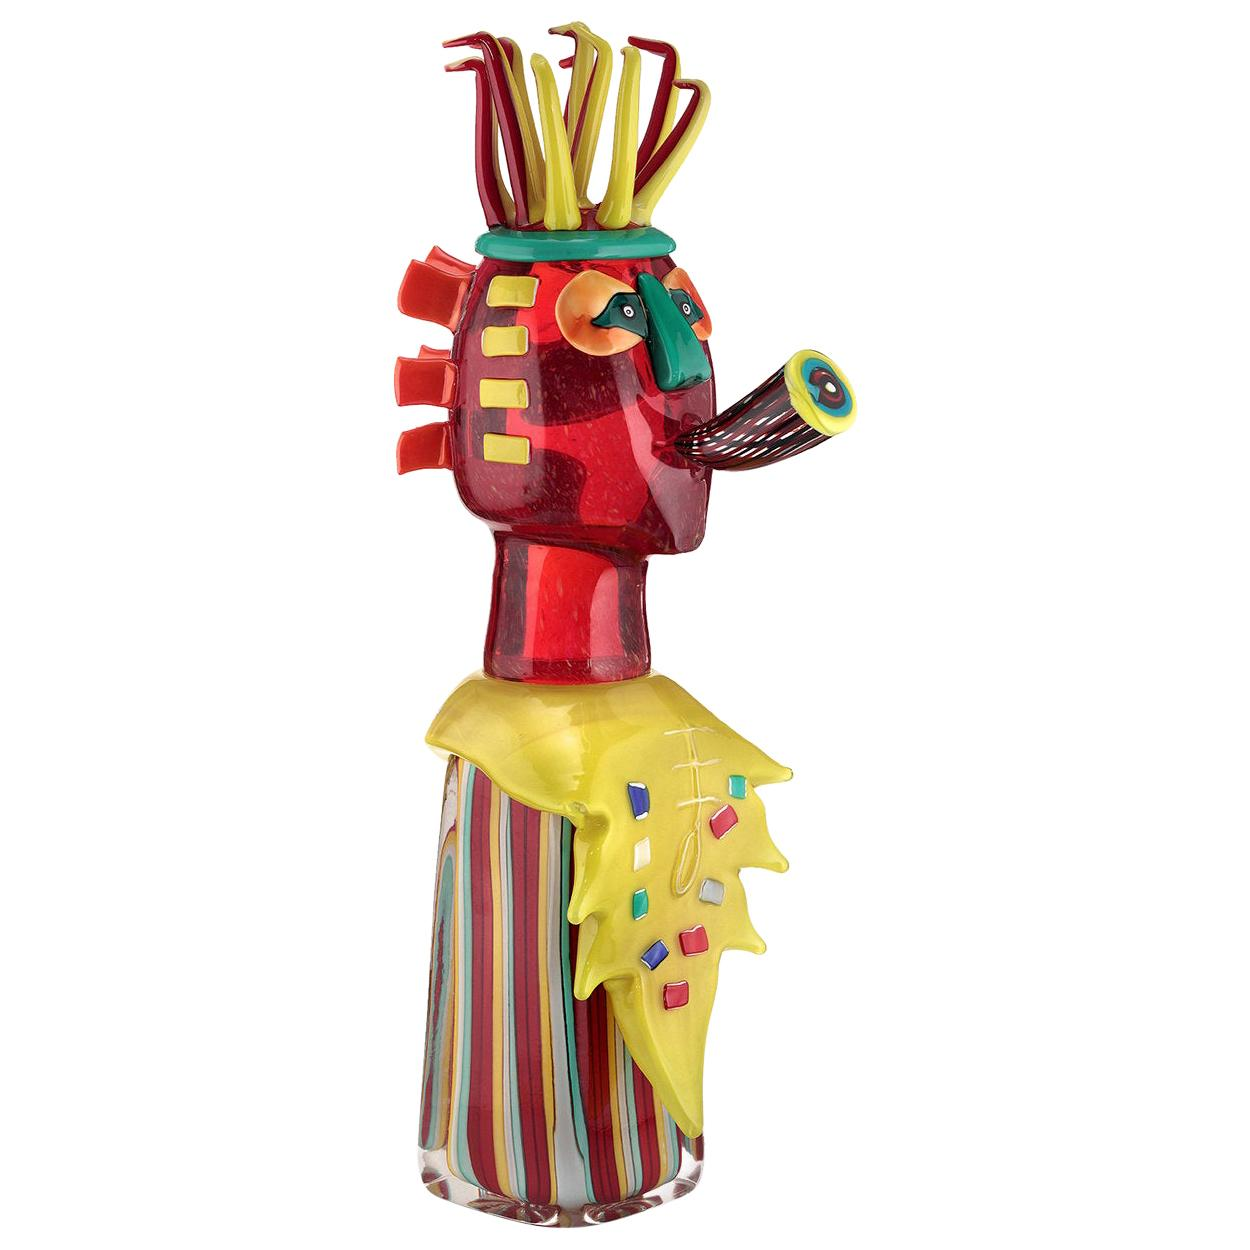 Trompetista Sculpture by Alfredo Sosabravo Limited Edition